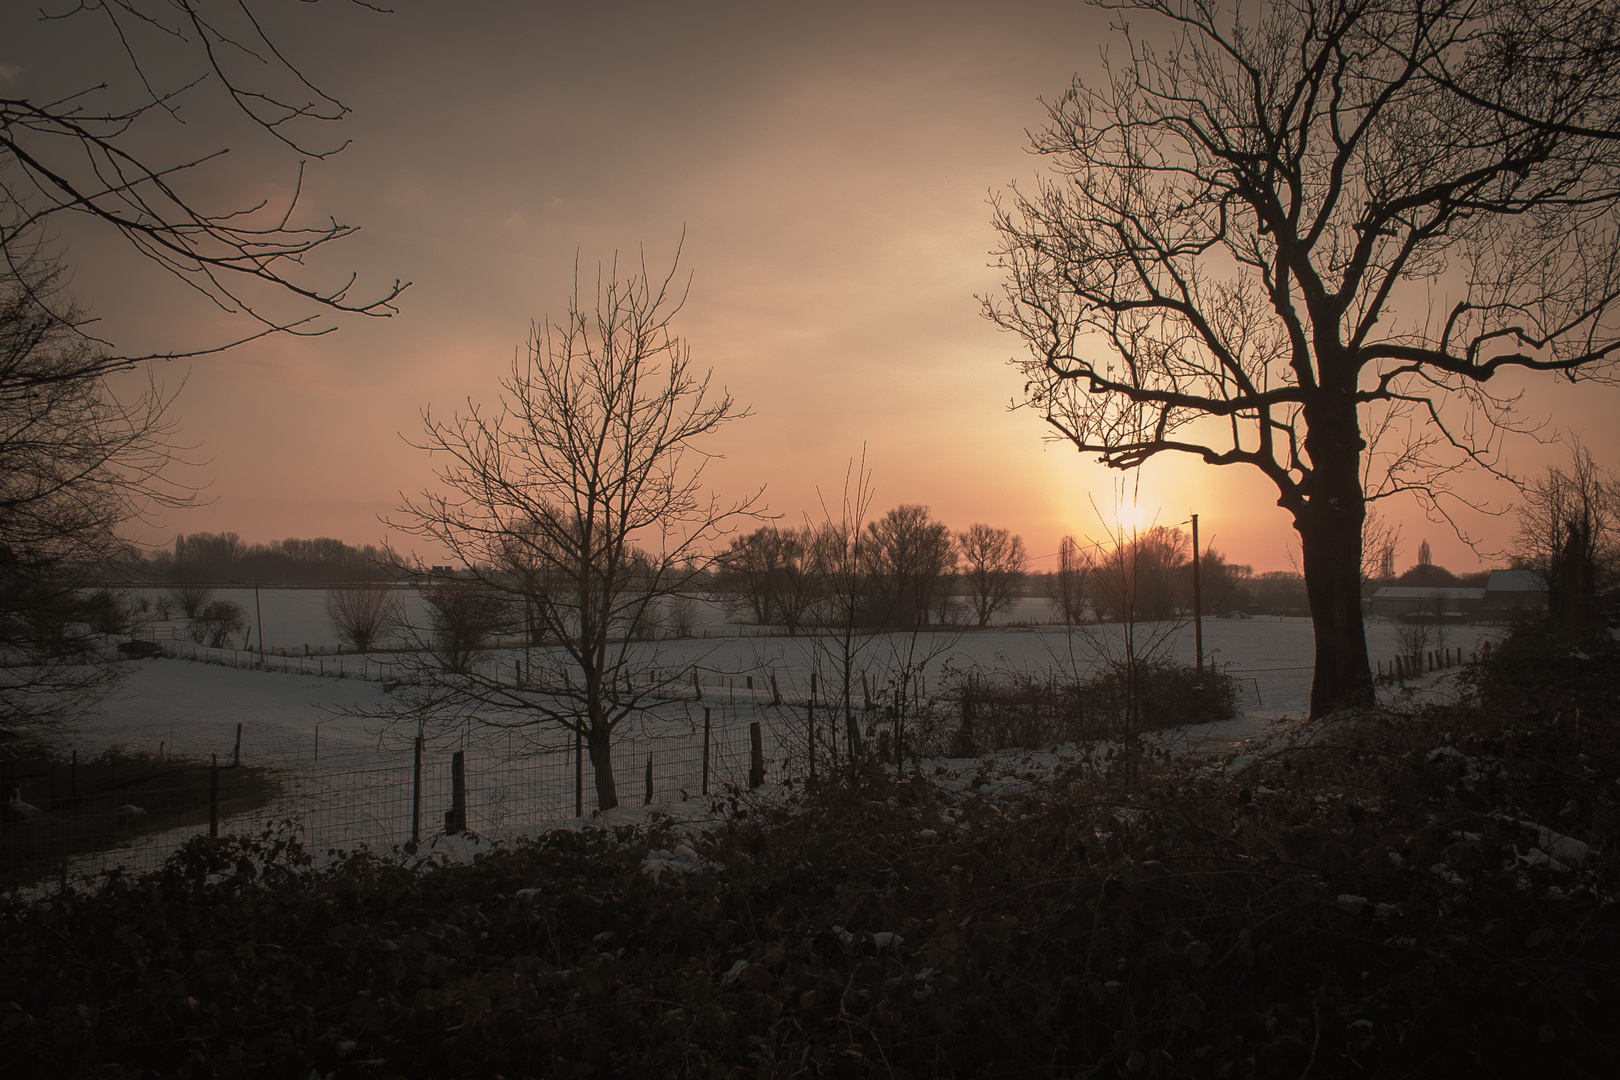 Winter-Wonderland at sunset